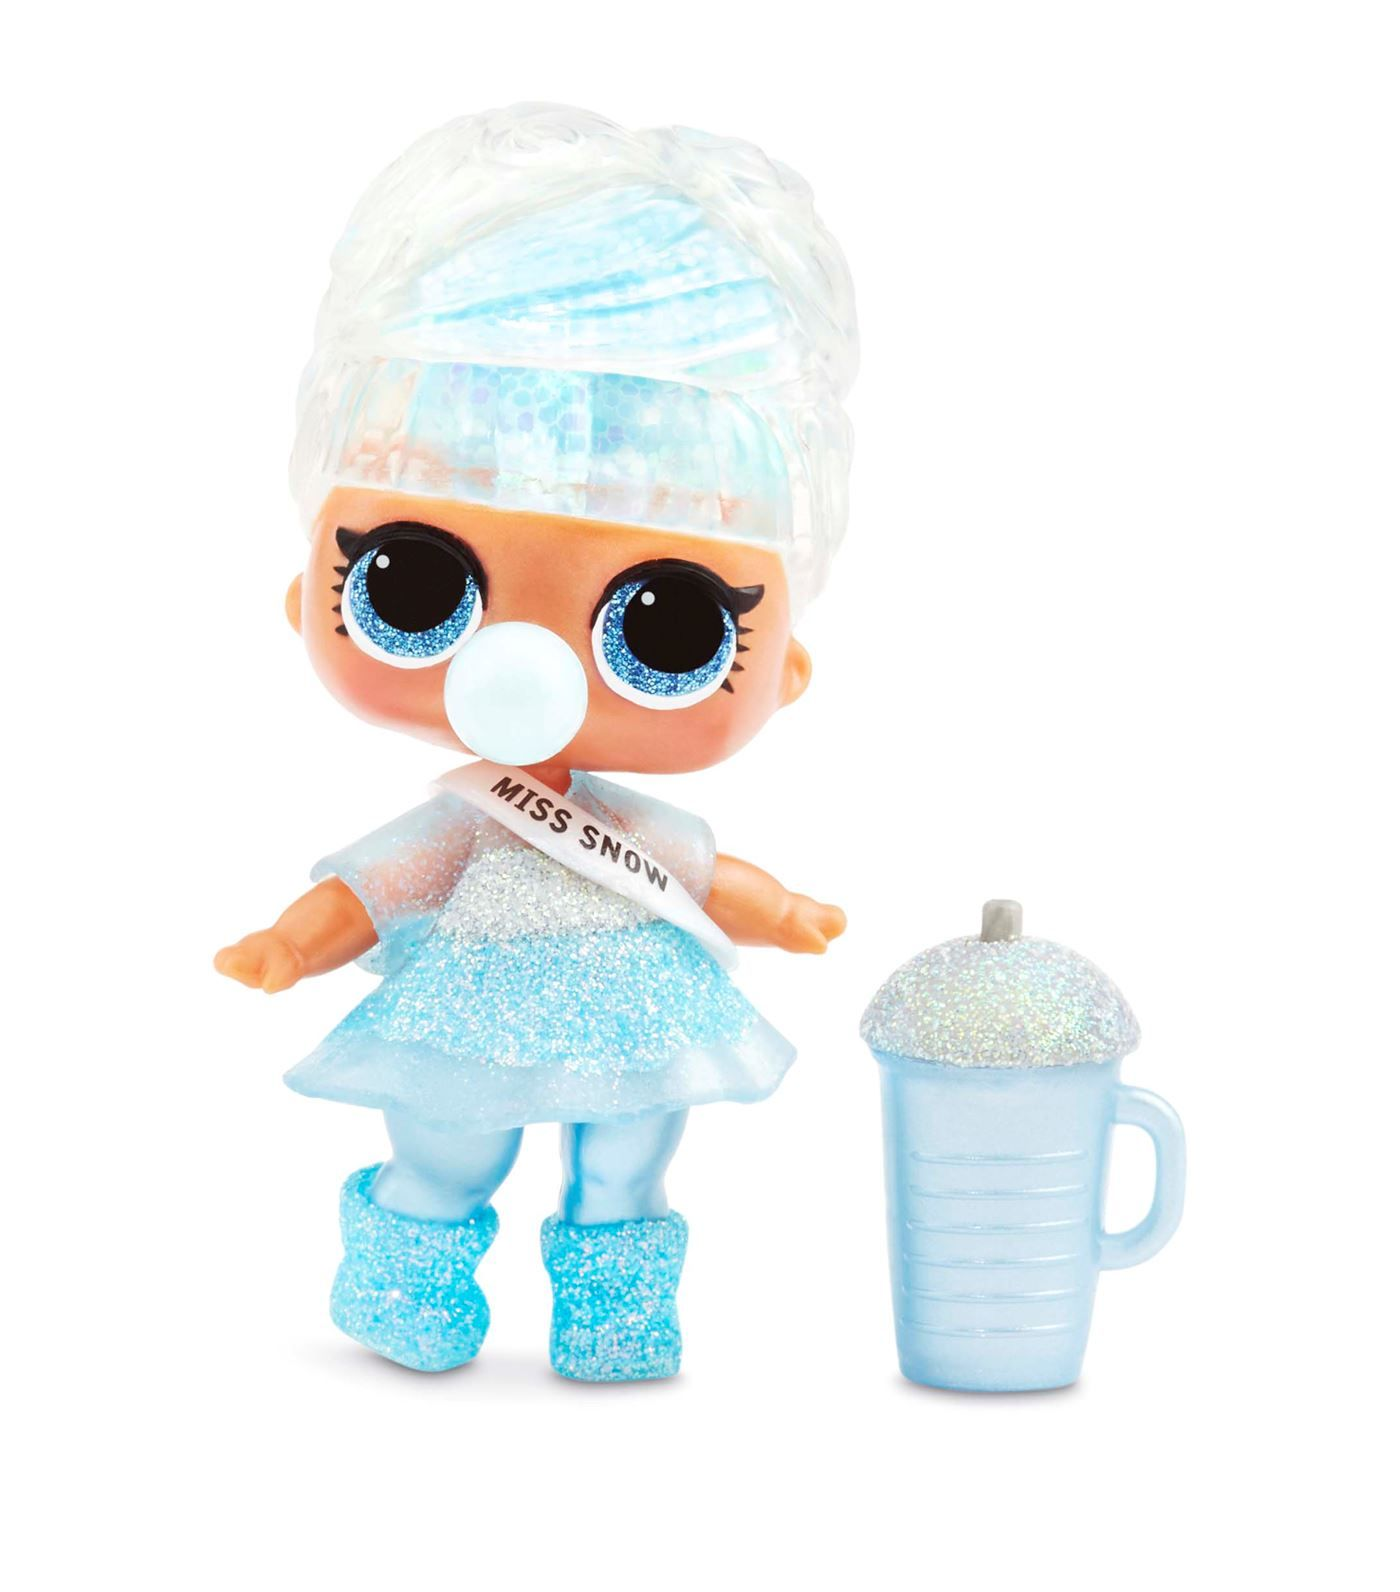 LOL Surprise Glitter Globe Doll Winter Disco Series with Glitter Hair Fun Gift